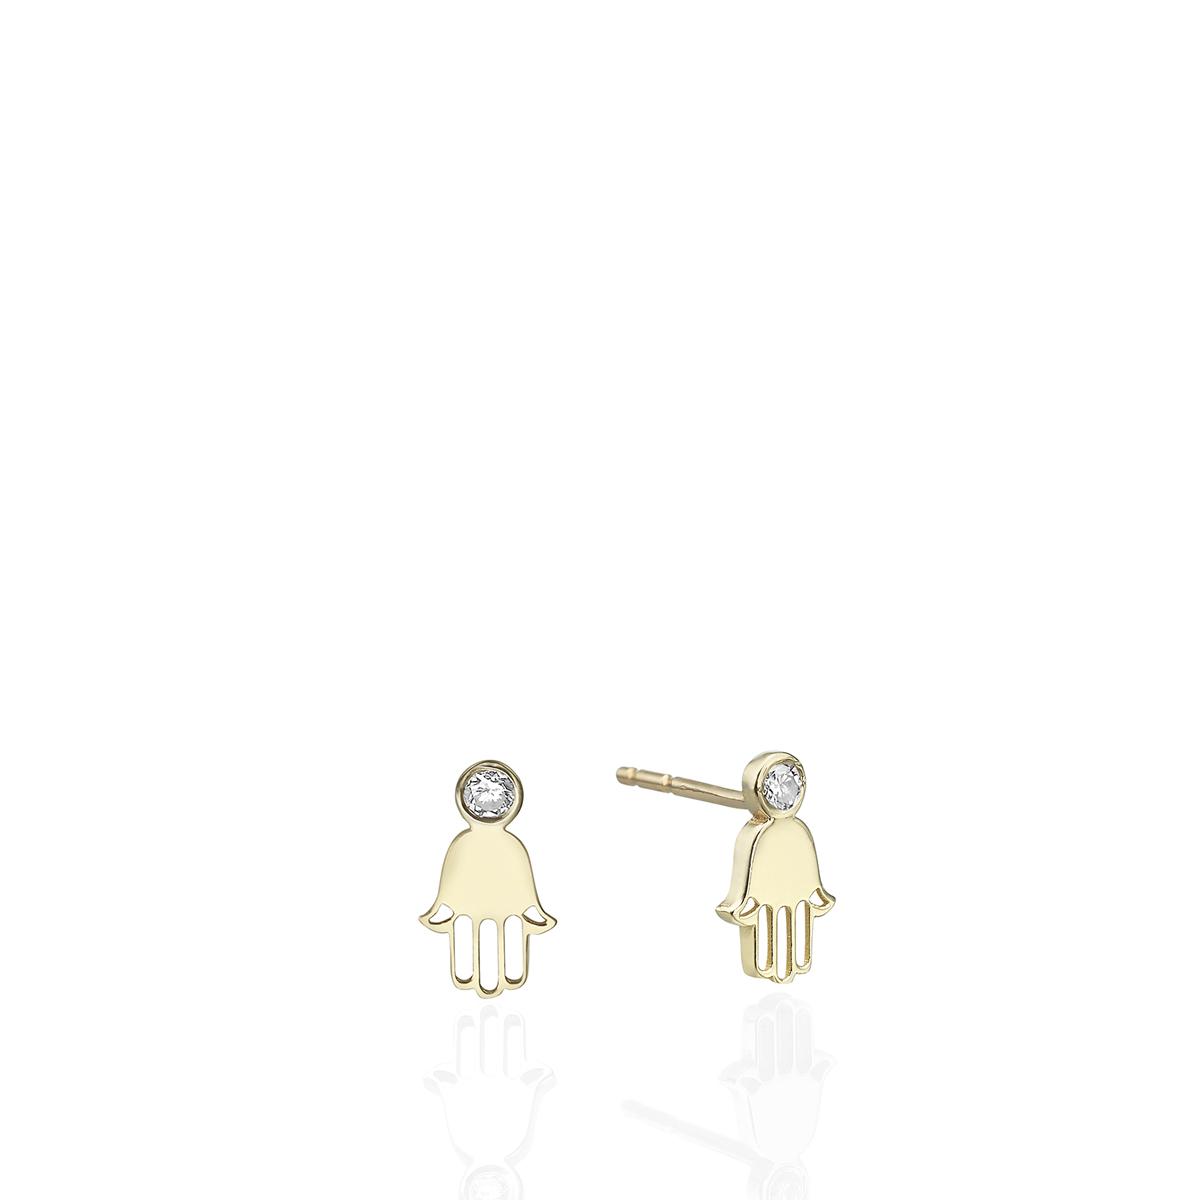 Gold Hamsa Earrings Set With Diamonds